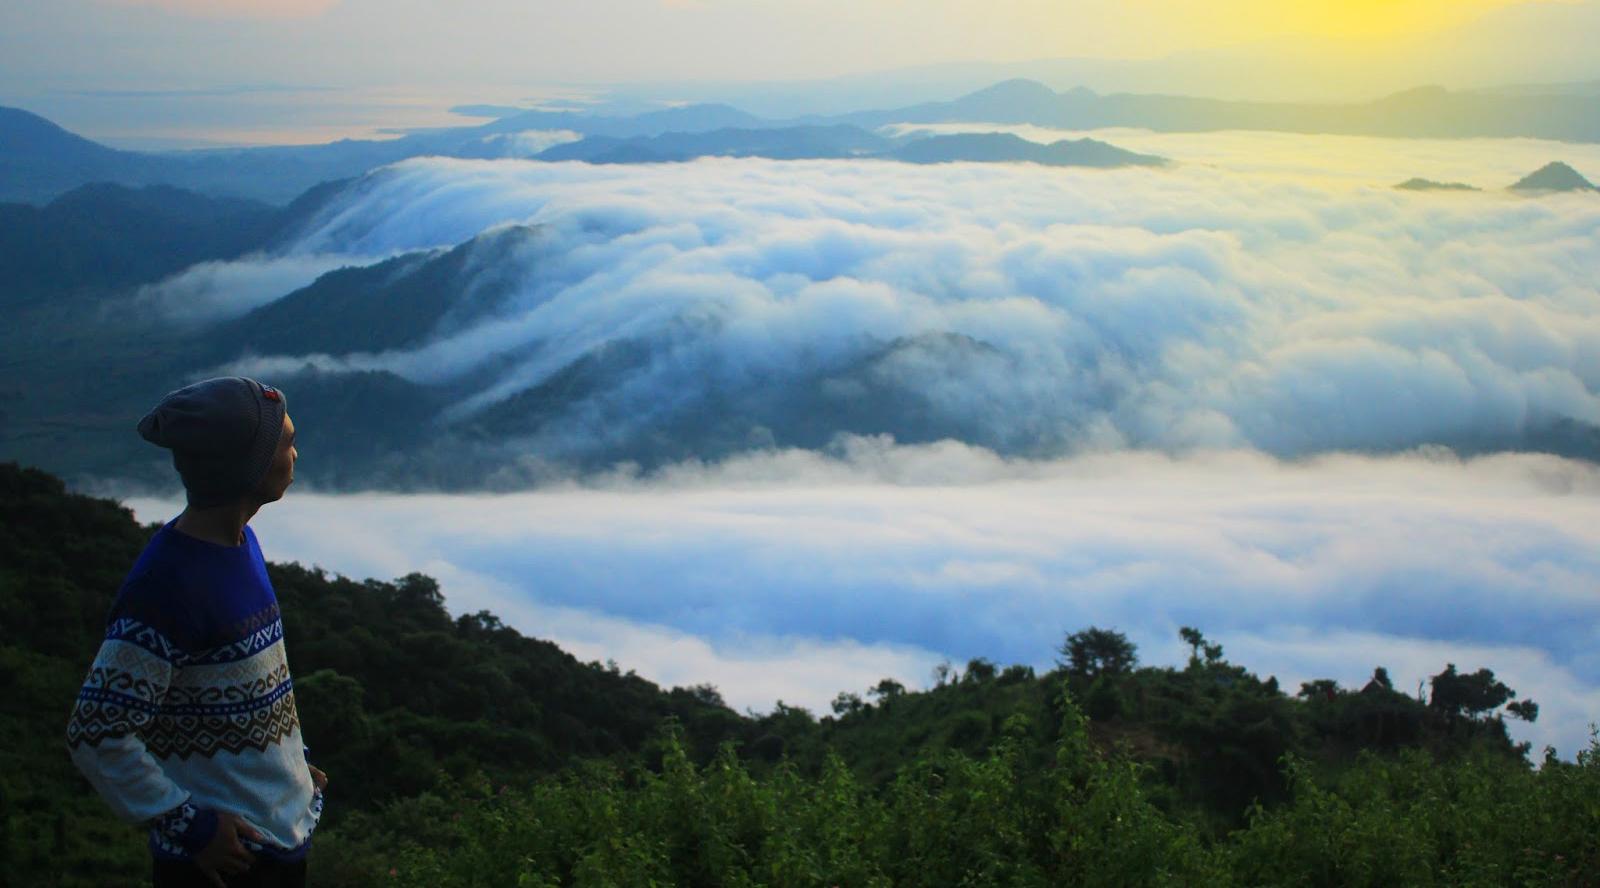 Sunrise paling indah kabut yang jelek dari Lolai Mantar, Sumbawa Barat.